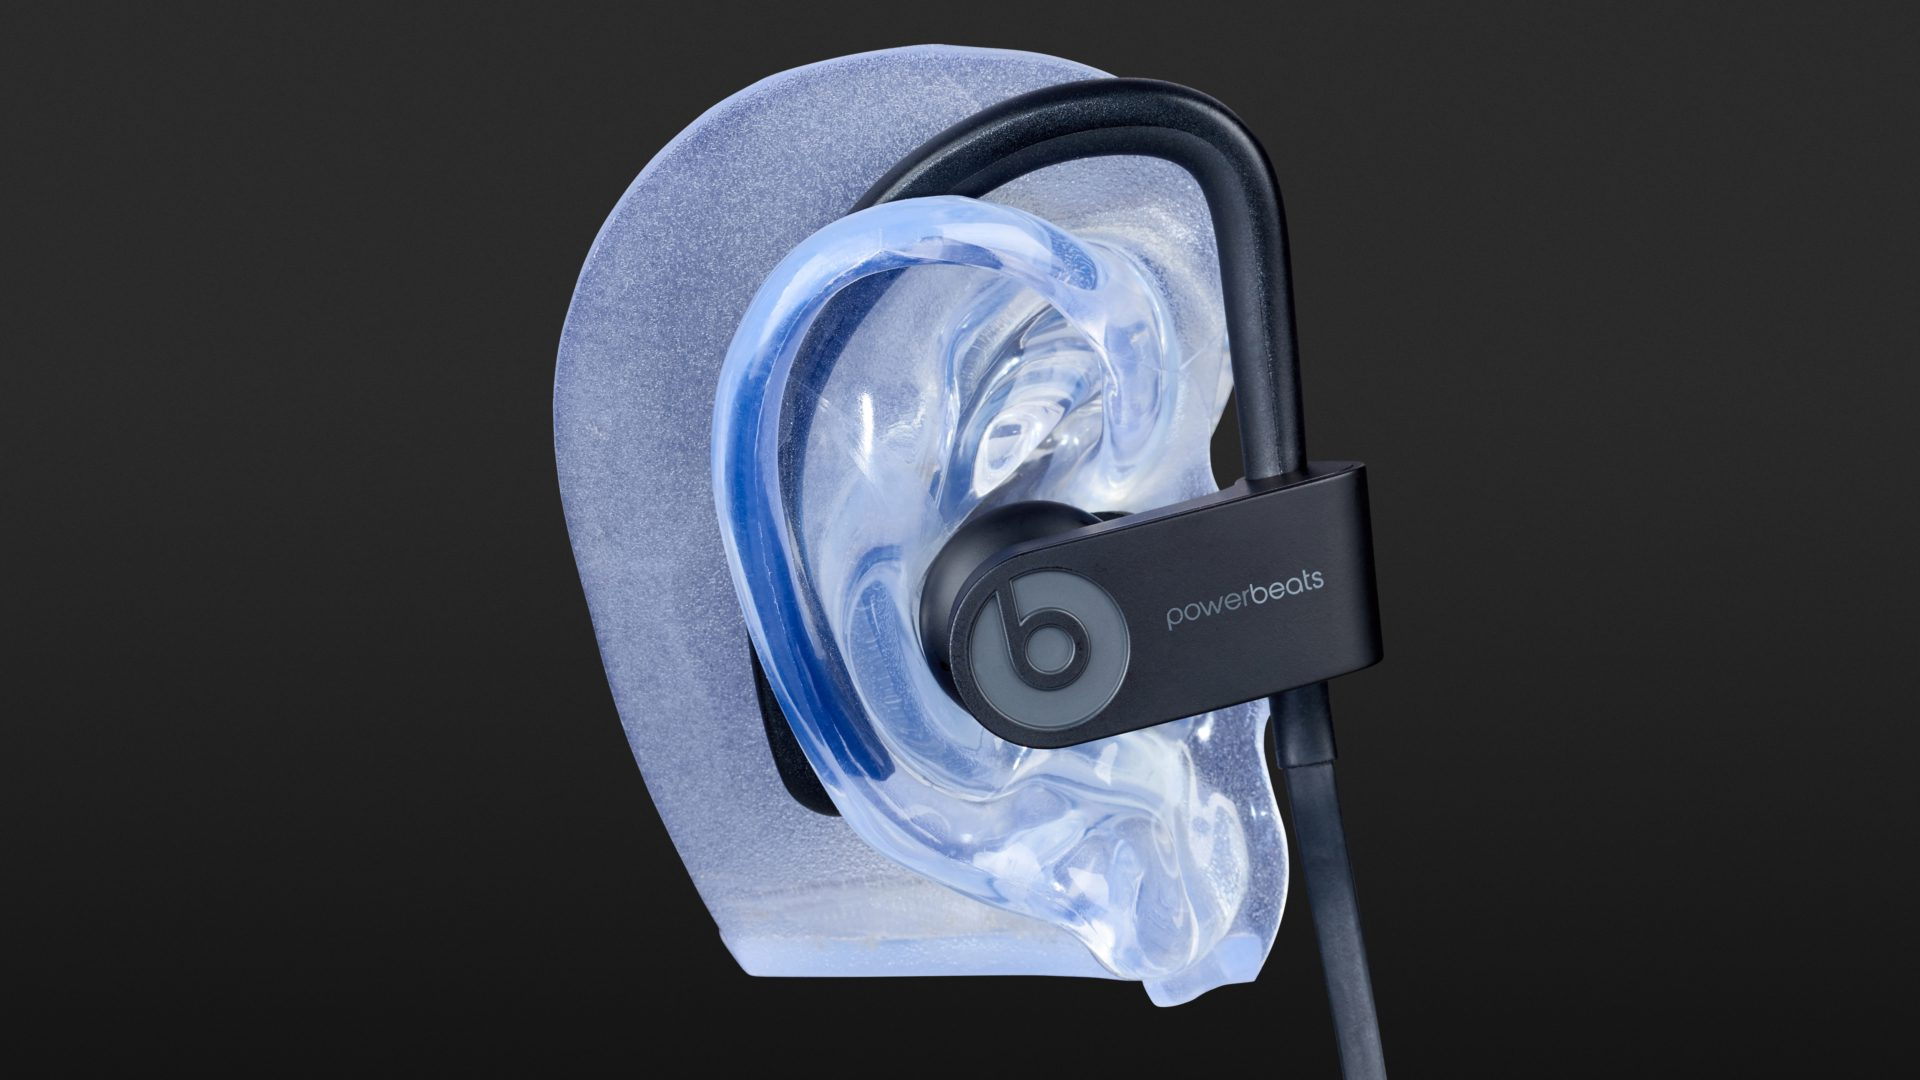 beats by dr dre powerbeats3 wireless im test bei. Black Bedroom Furniture Sets. Home Design Ideas